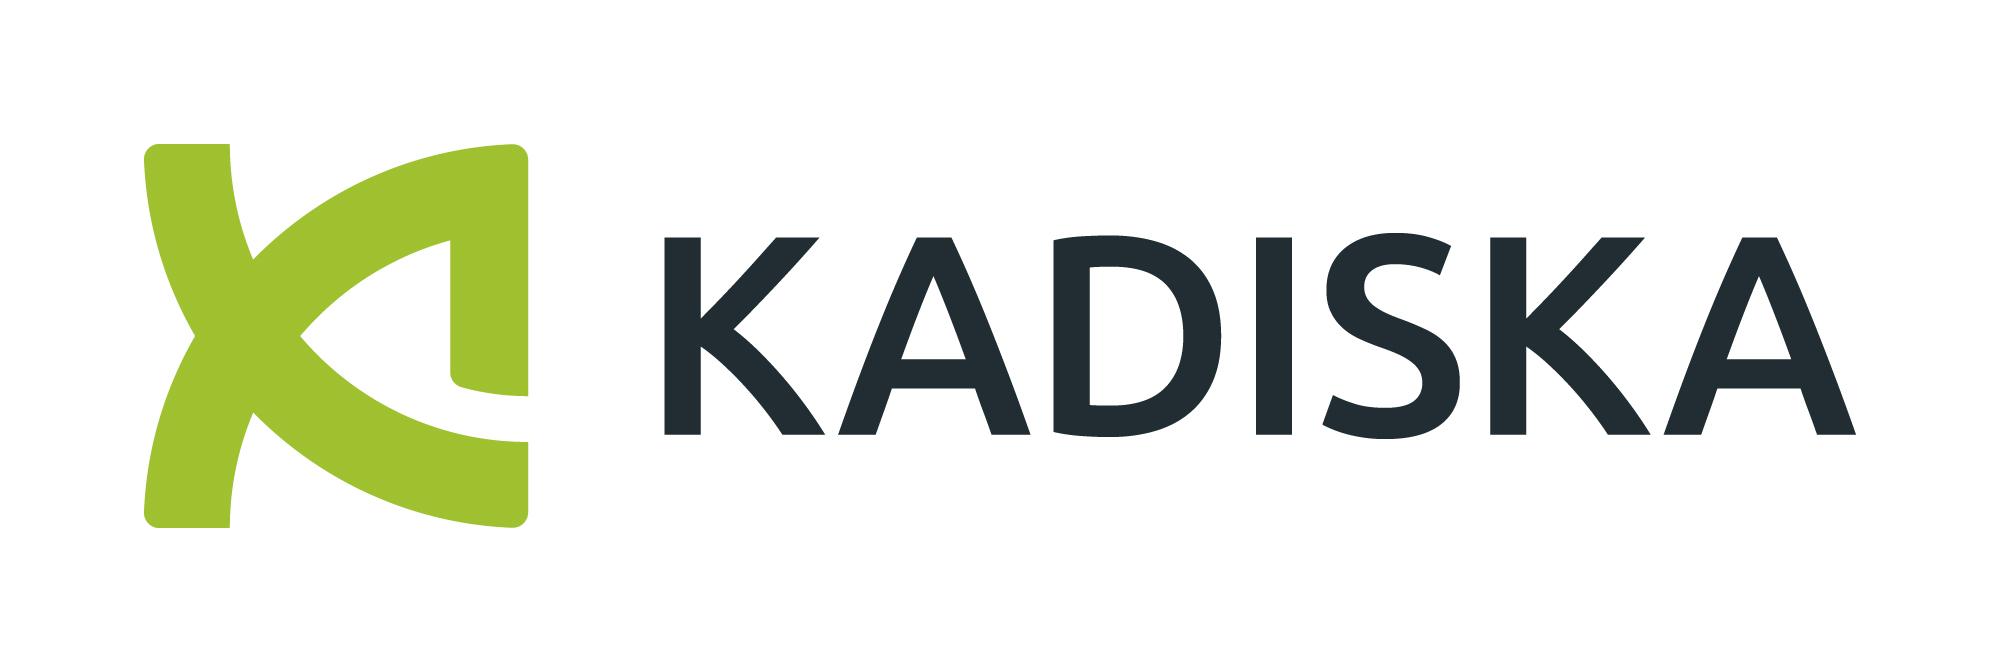 Kadiska